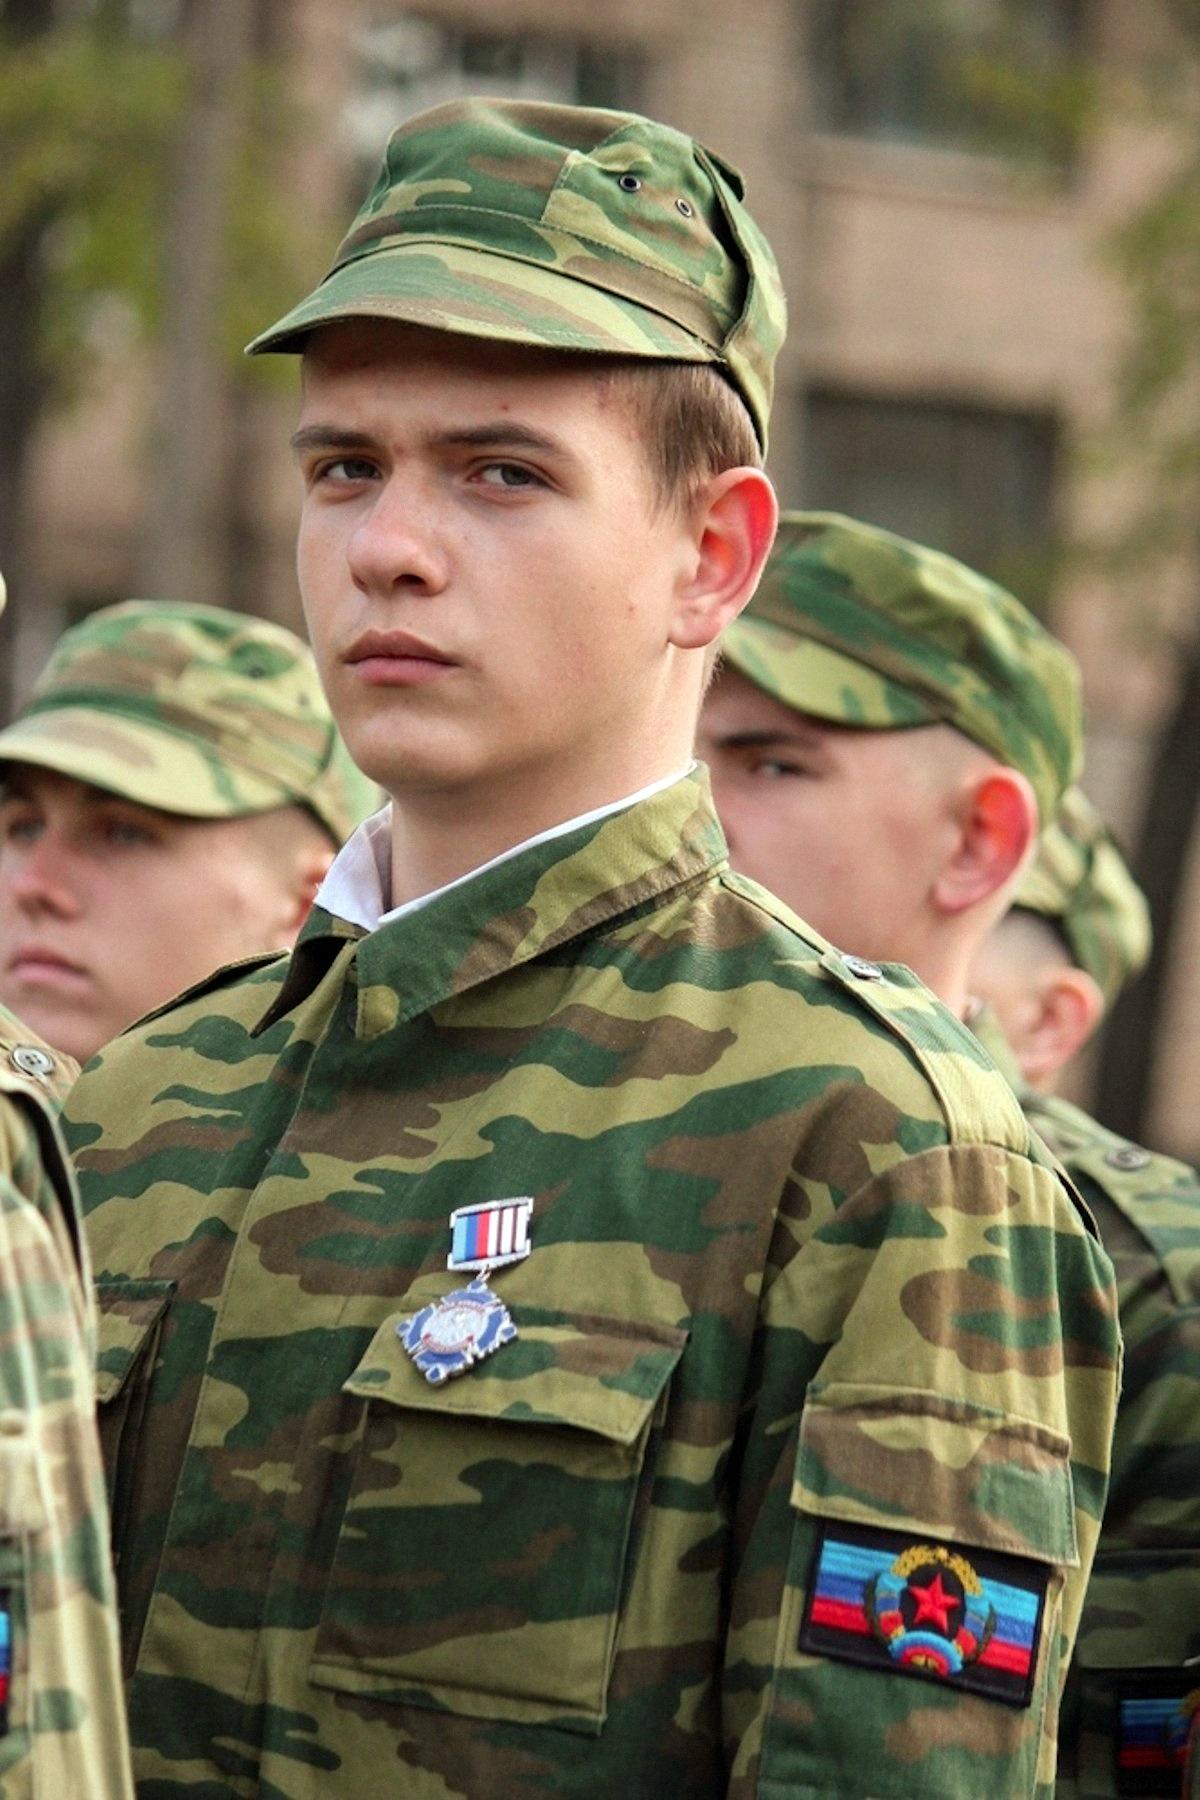 00 lugansk pr lnr cossack cadet corps 05 191015